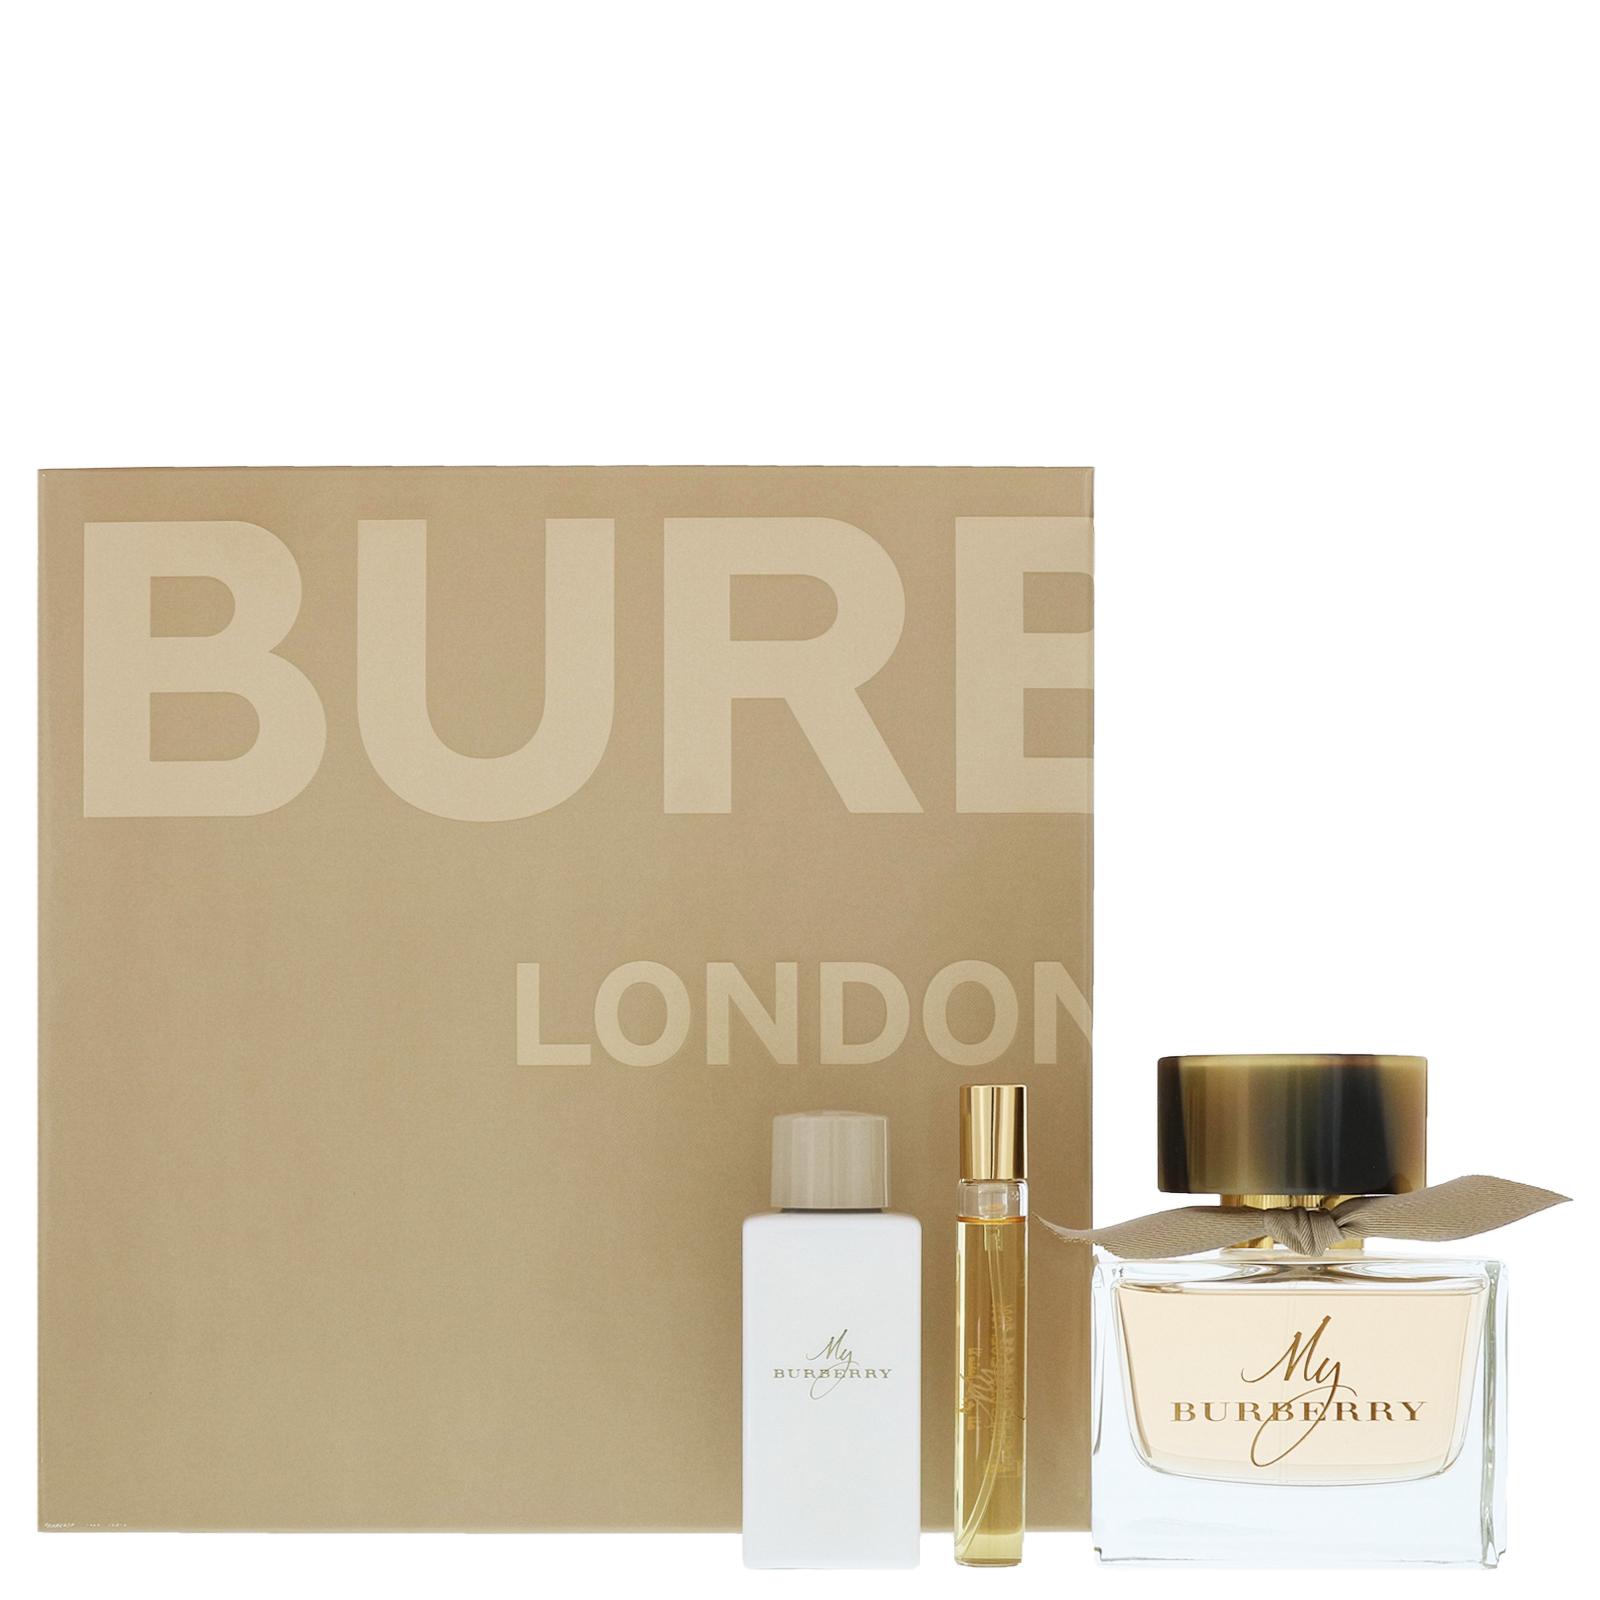 Burberry My Burberry For Her Eau de Parfum Spray 90ml Gift Set £40.45 @ All Beauty